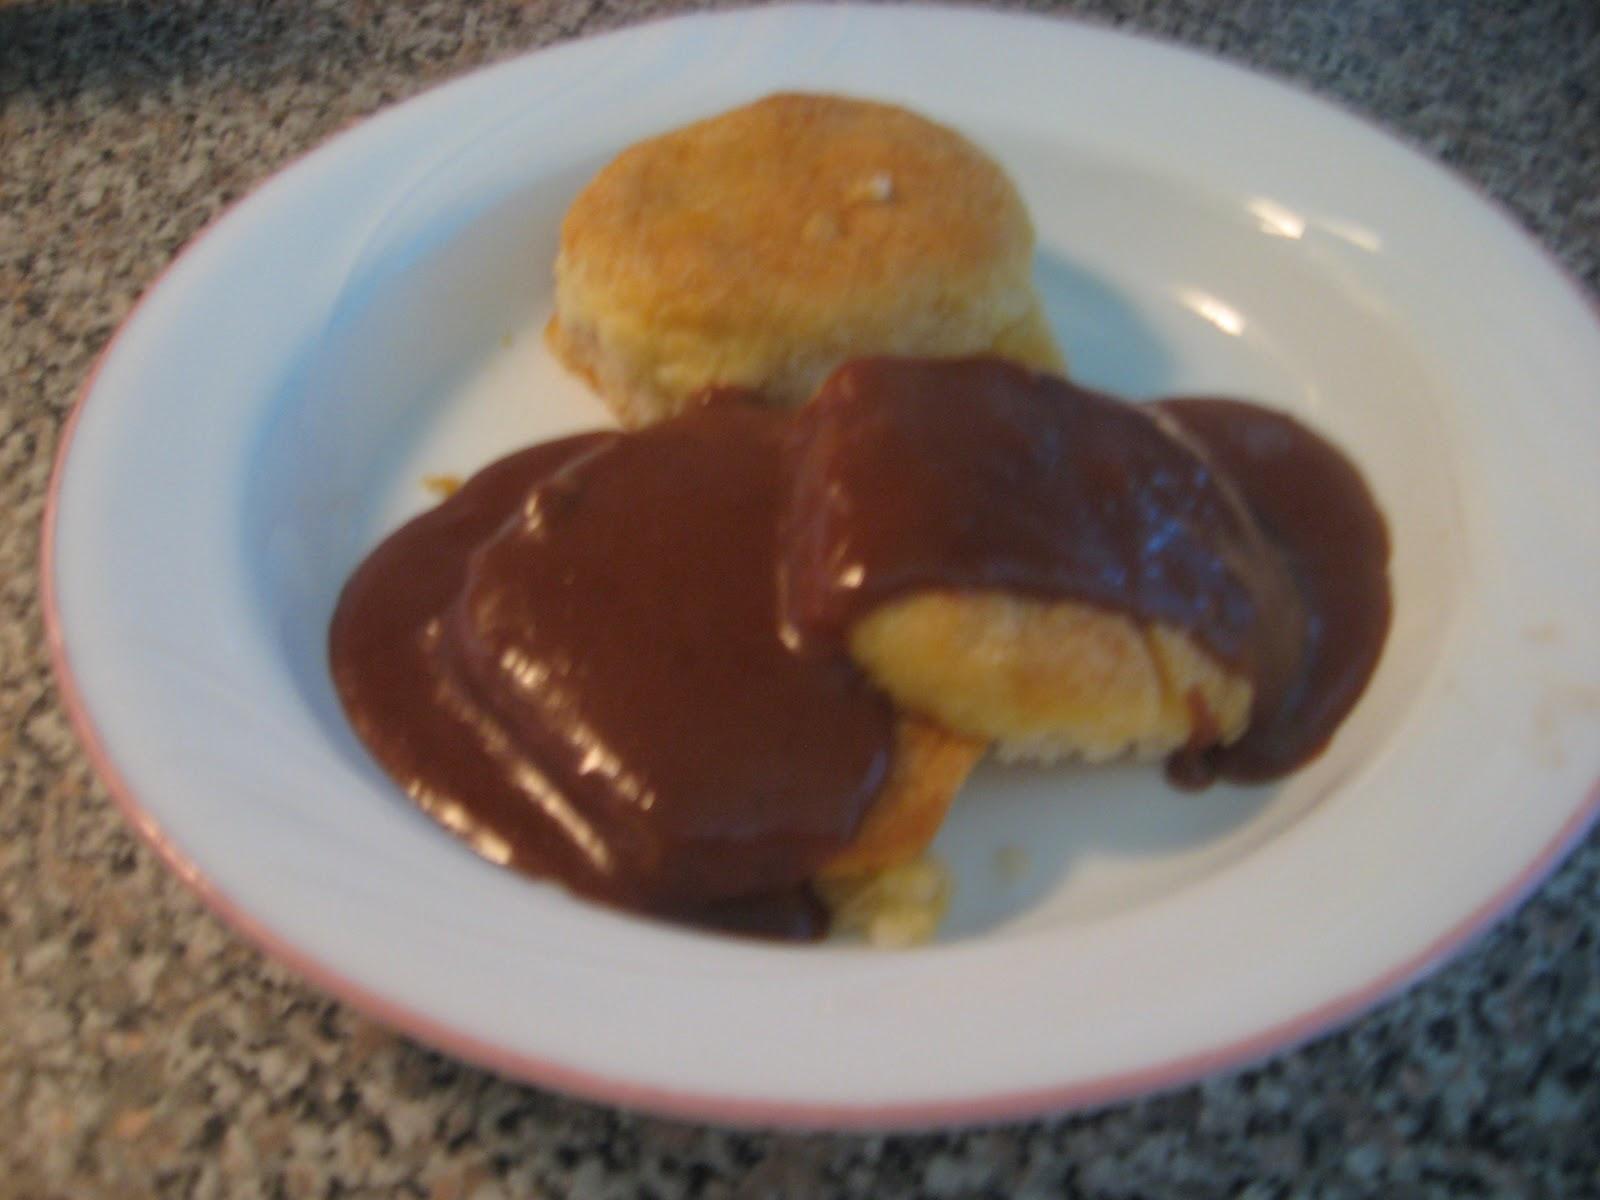 Grandma Gail's Front Porch: Chocolate Gravy